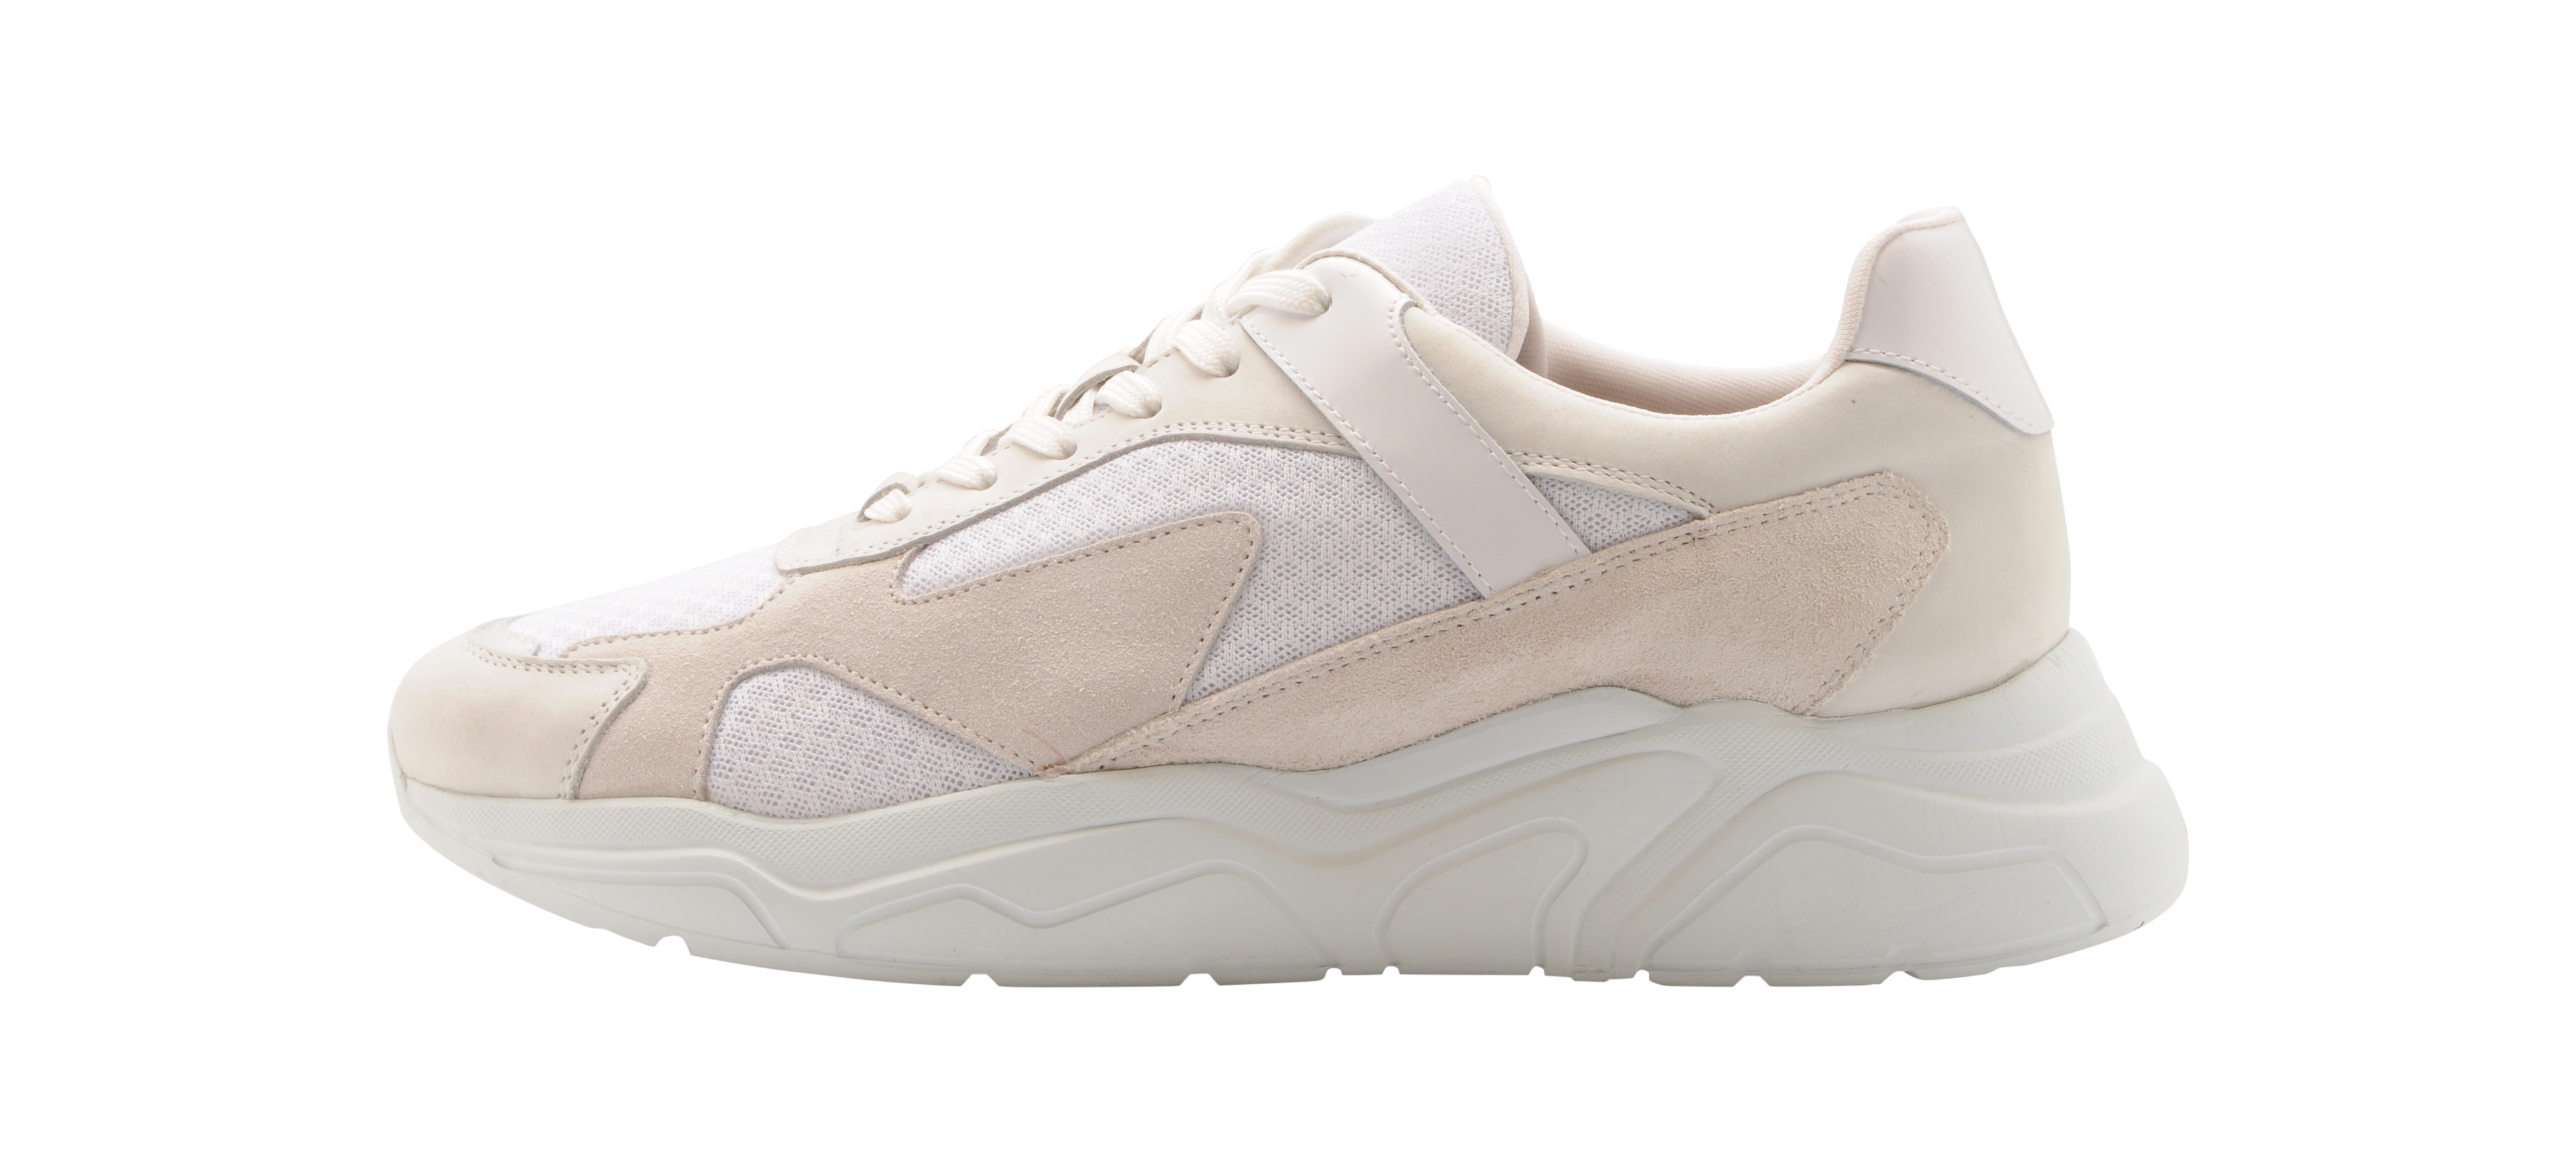 Bianco 64-71787 sneakers, white, 44